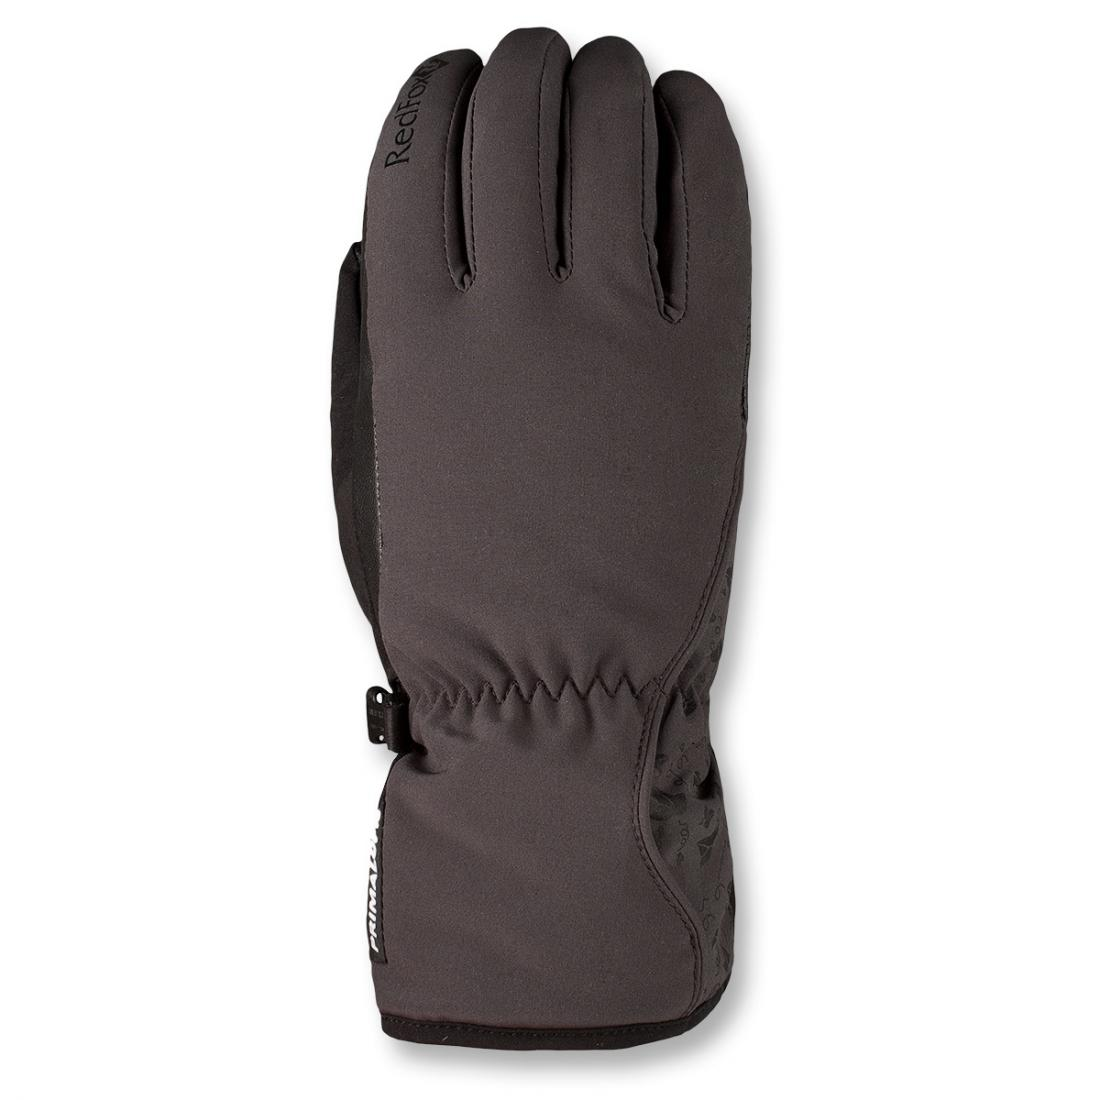 Перчатки женские RozaryПерчатки<br><br><br>Цвет: Черный<br>Размер: L